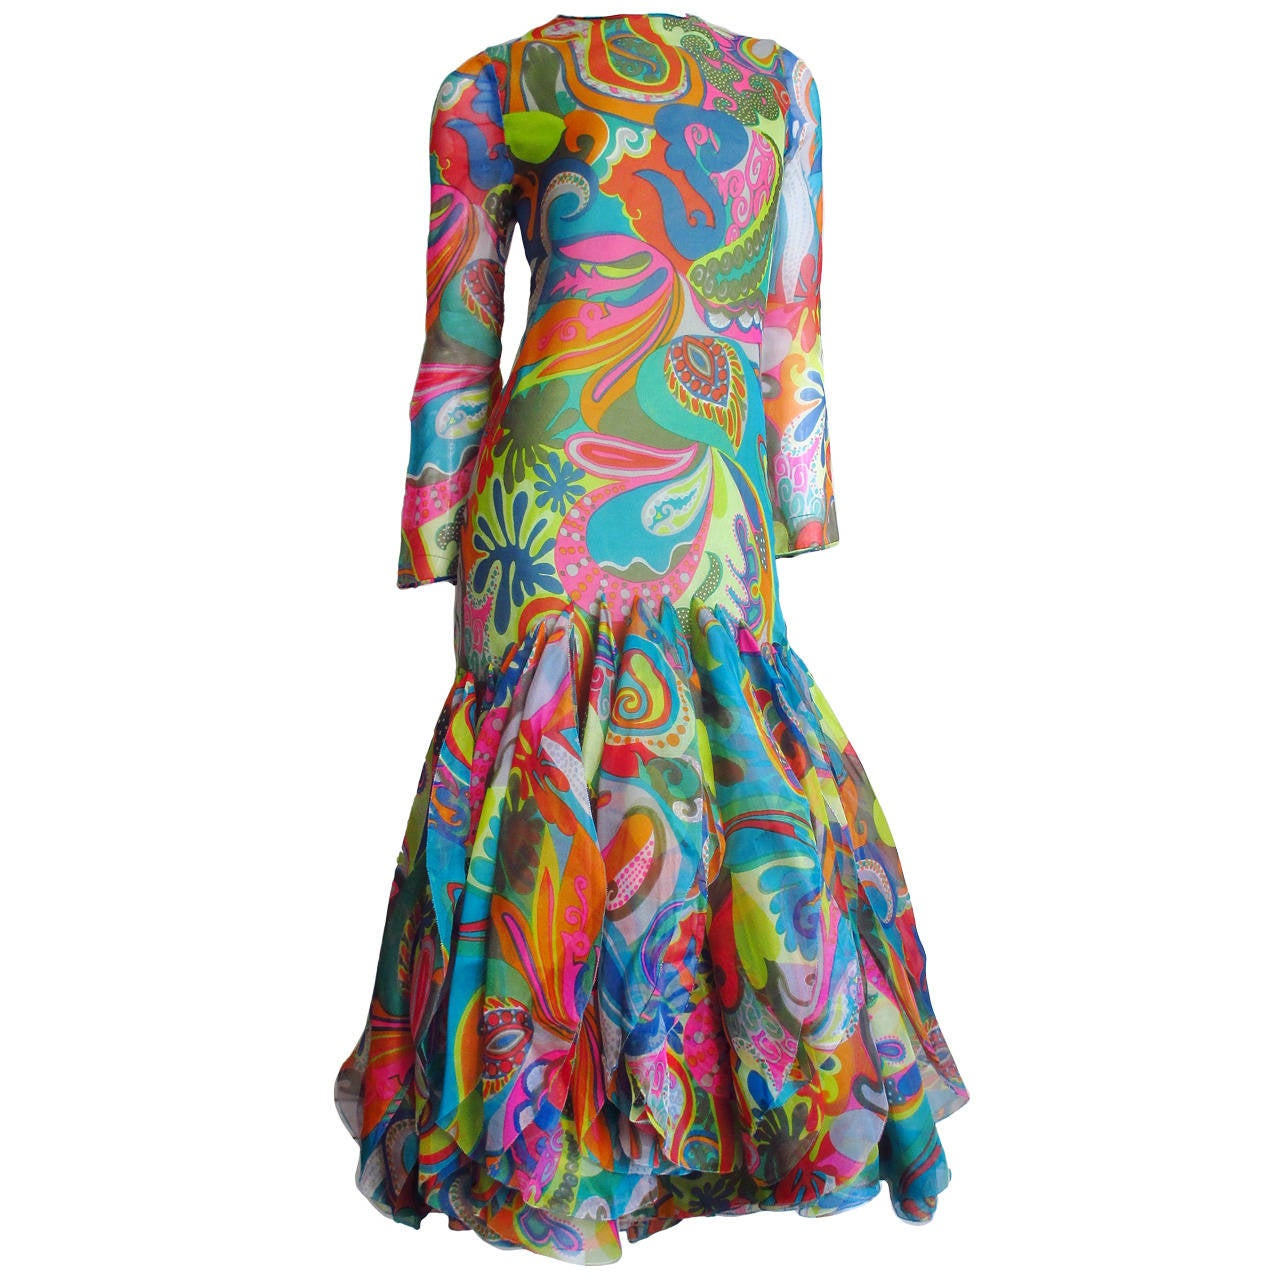 Incredible 1960s Pierre Cardin Psychedelic Orb Hem Dress 1